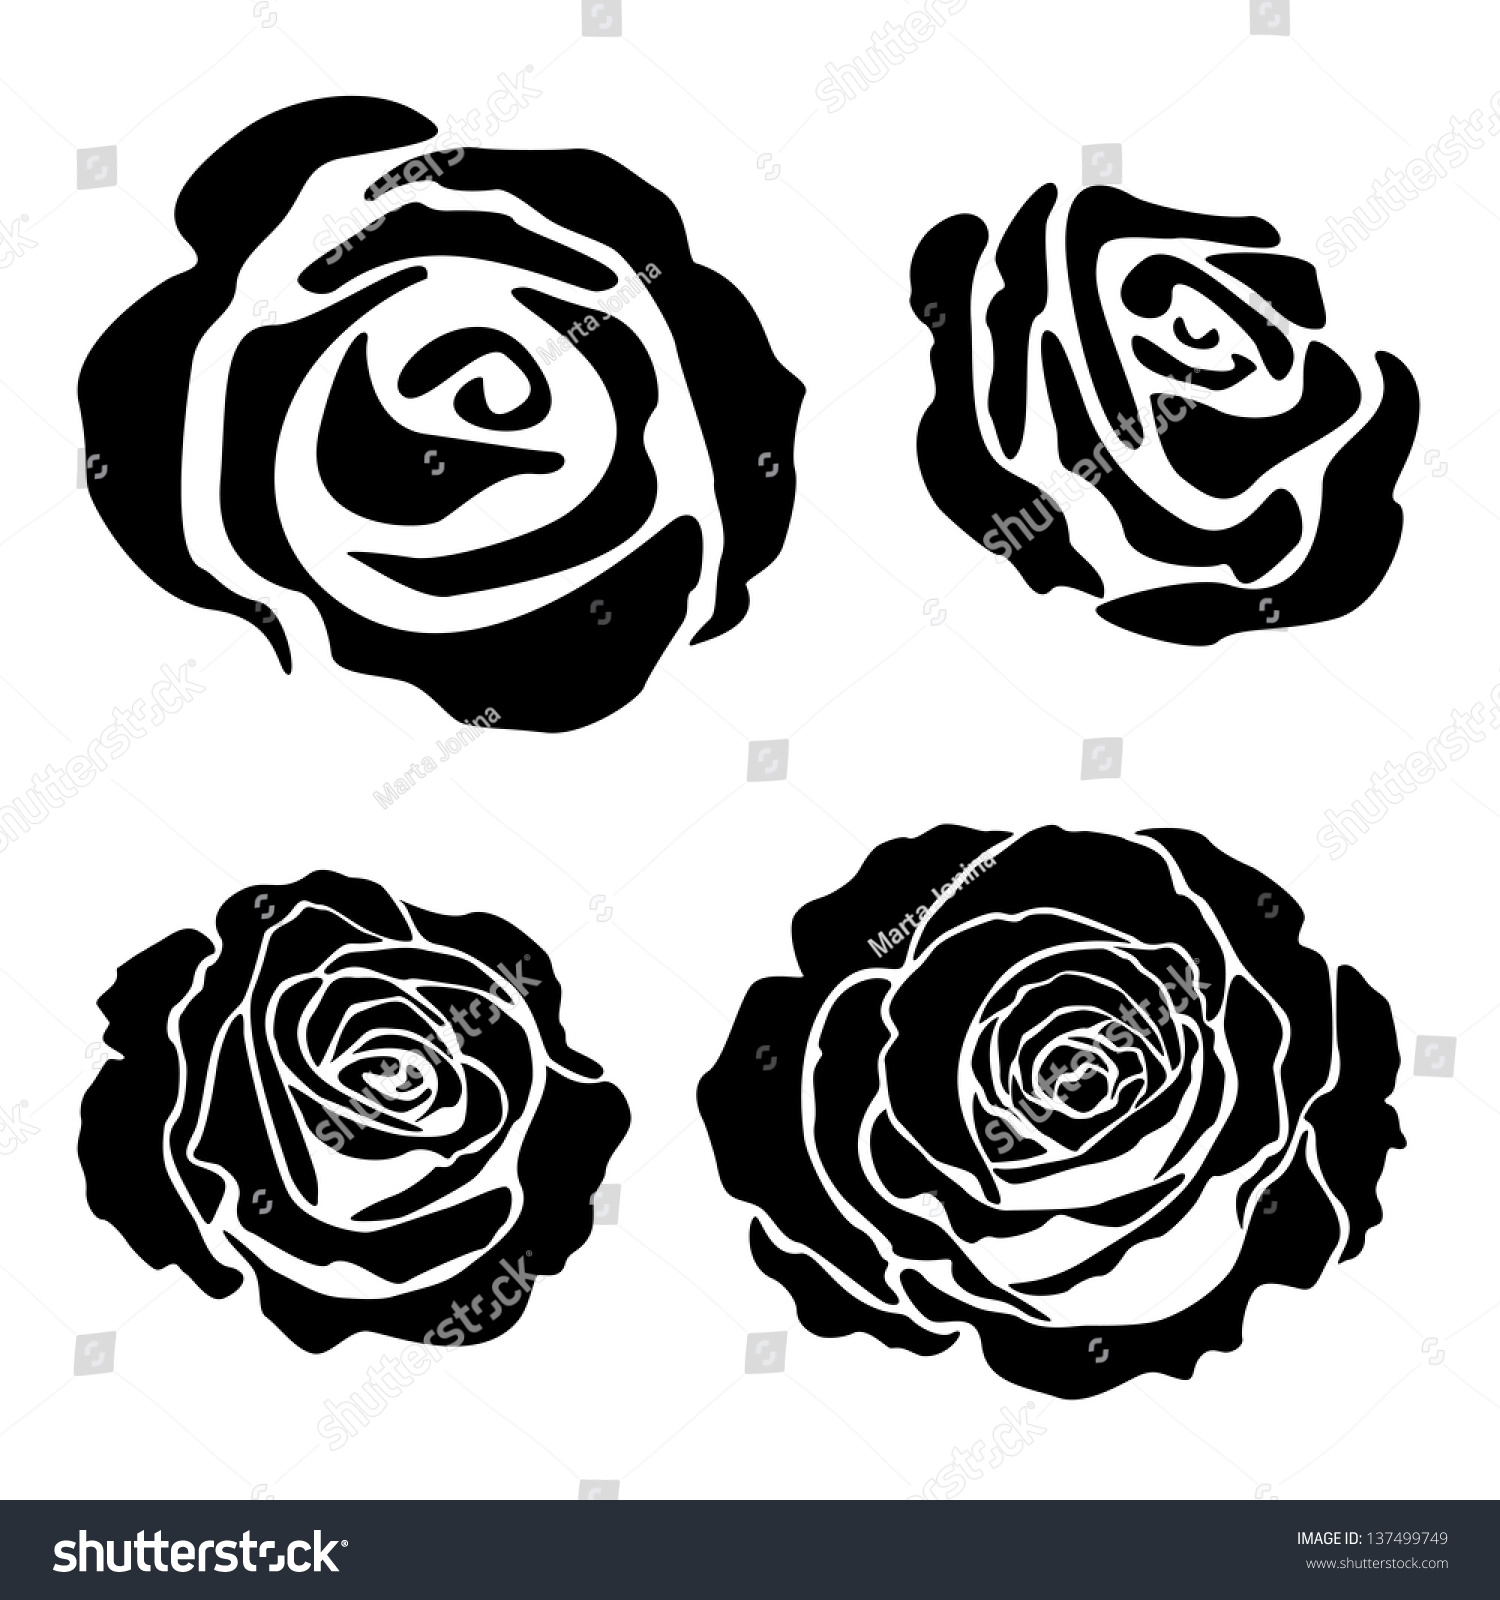 Simple Rose Silhouette | www.imgkid.com - The Image Kid ...